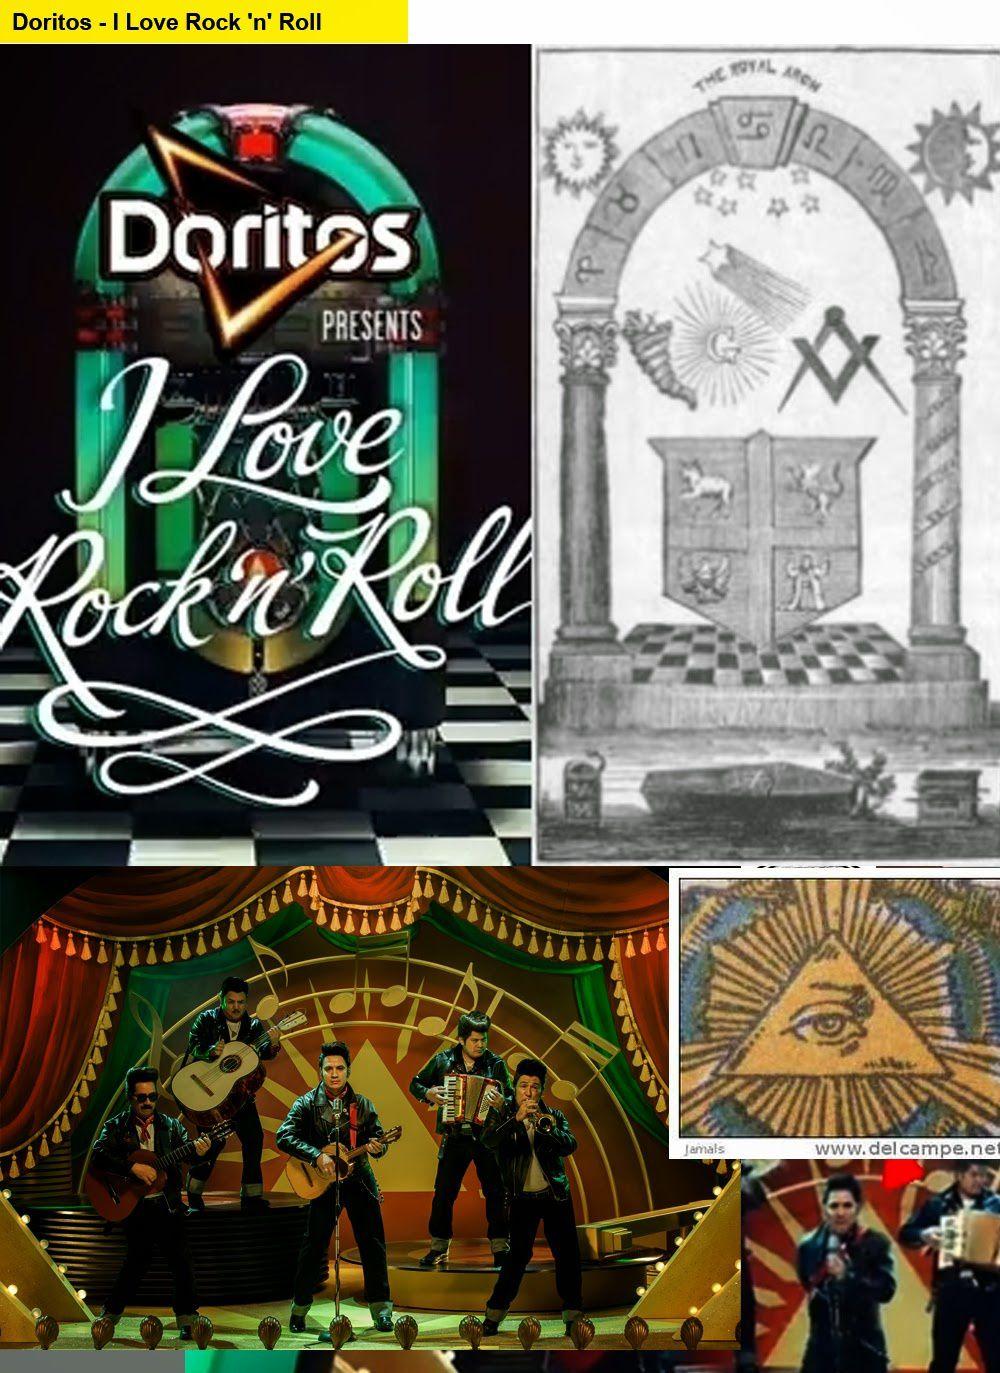 Où trouver les symboles : Doritos